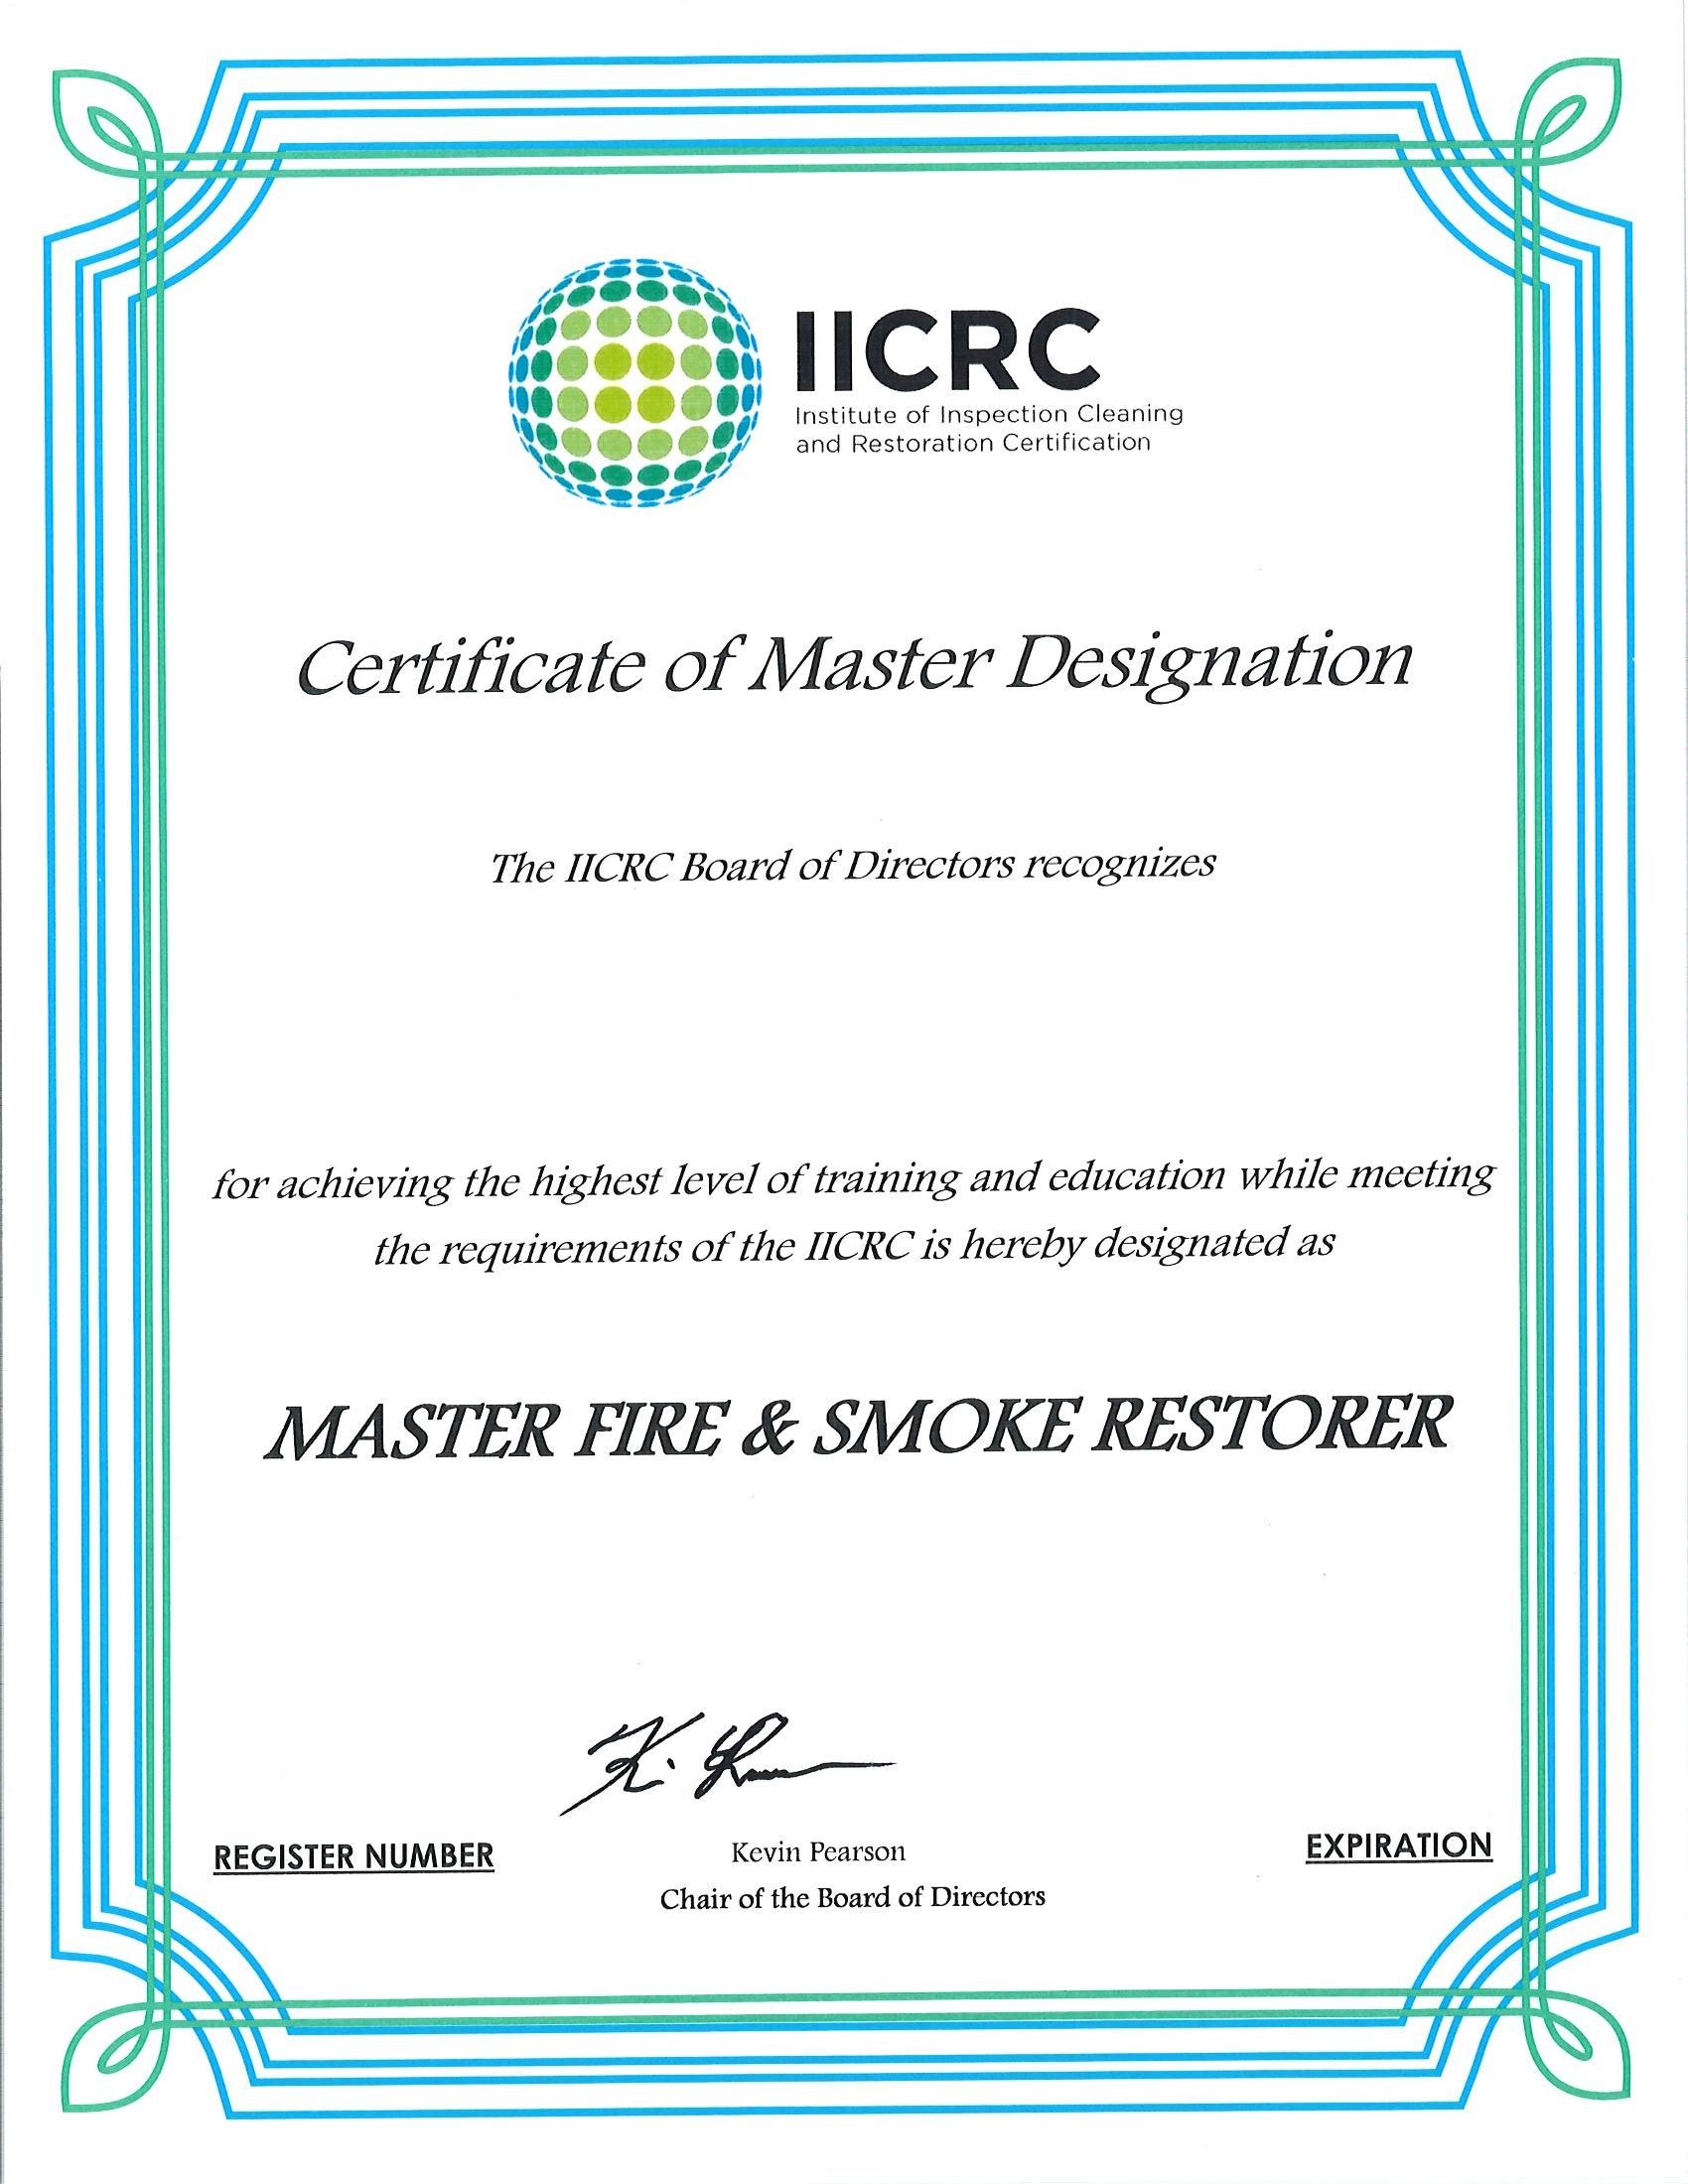 IICRC Certificate 5